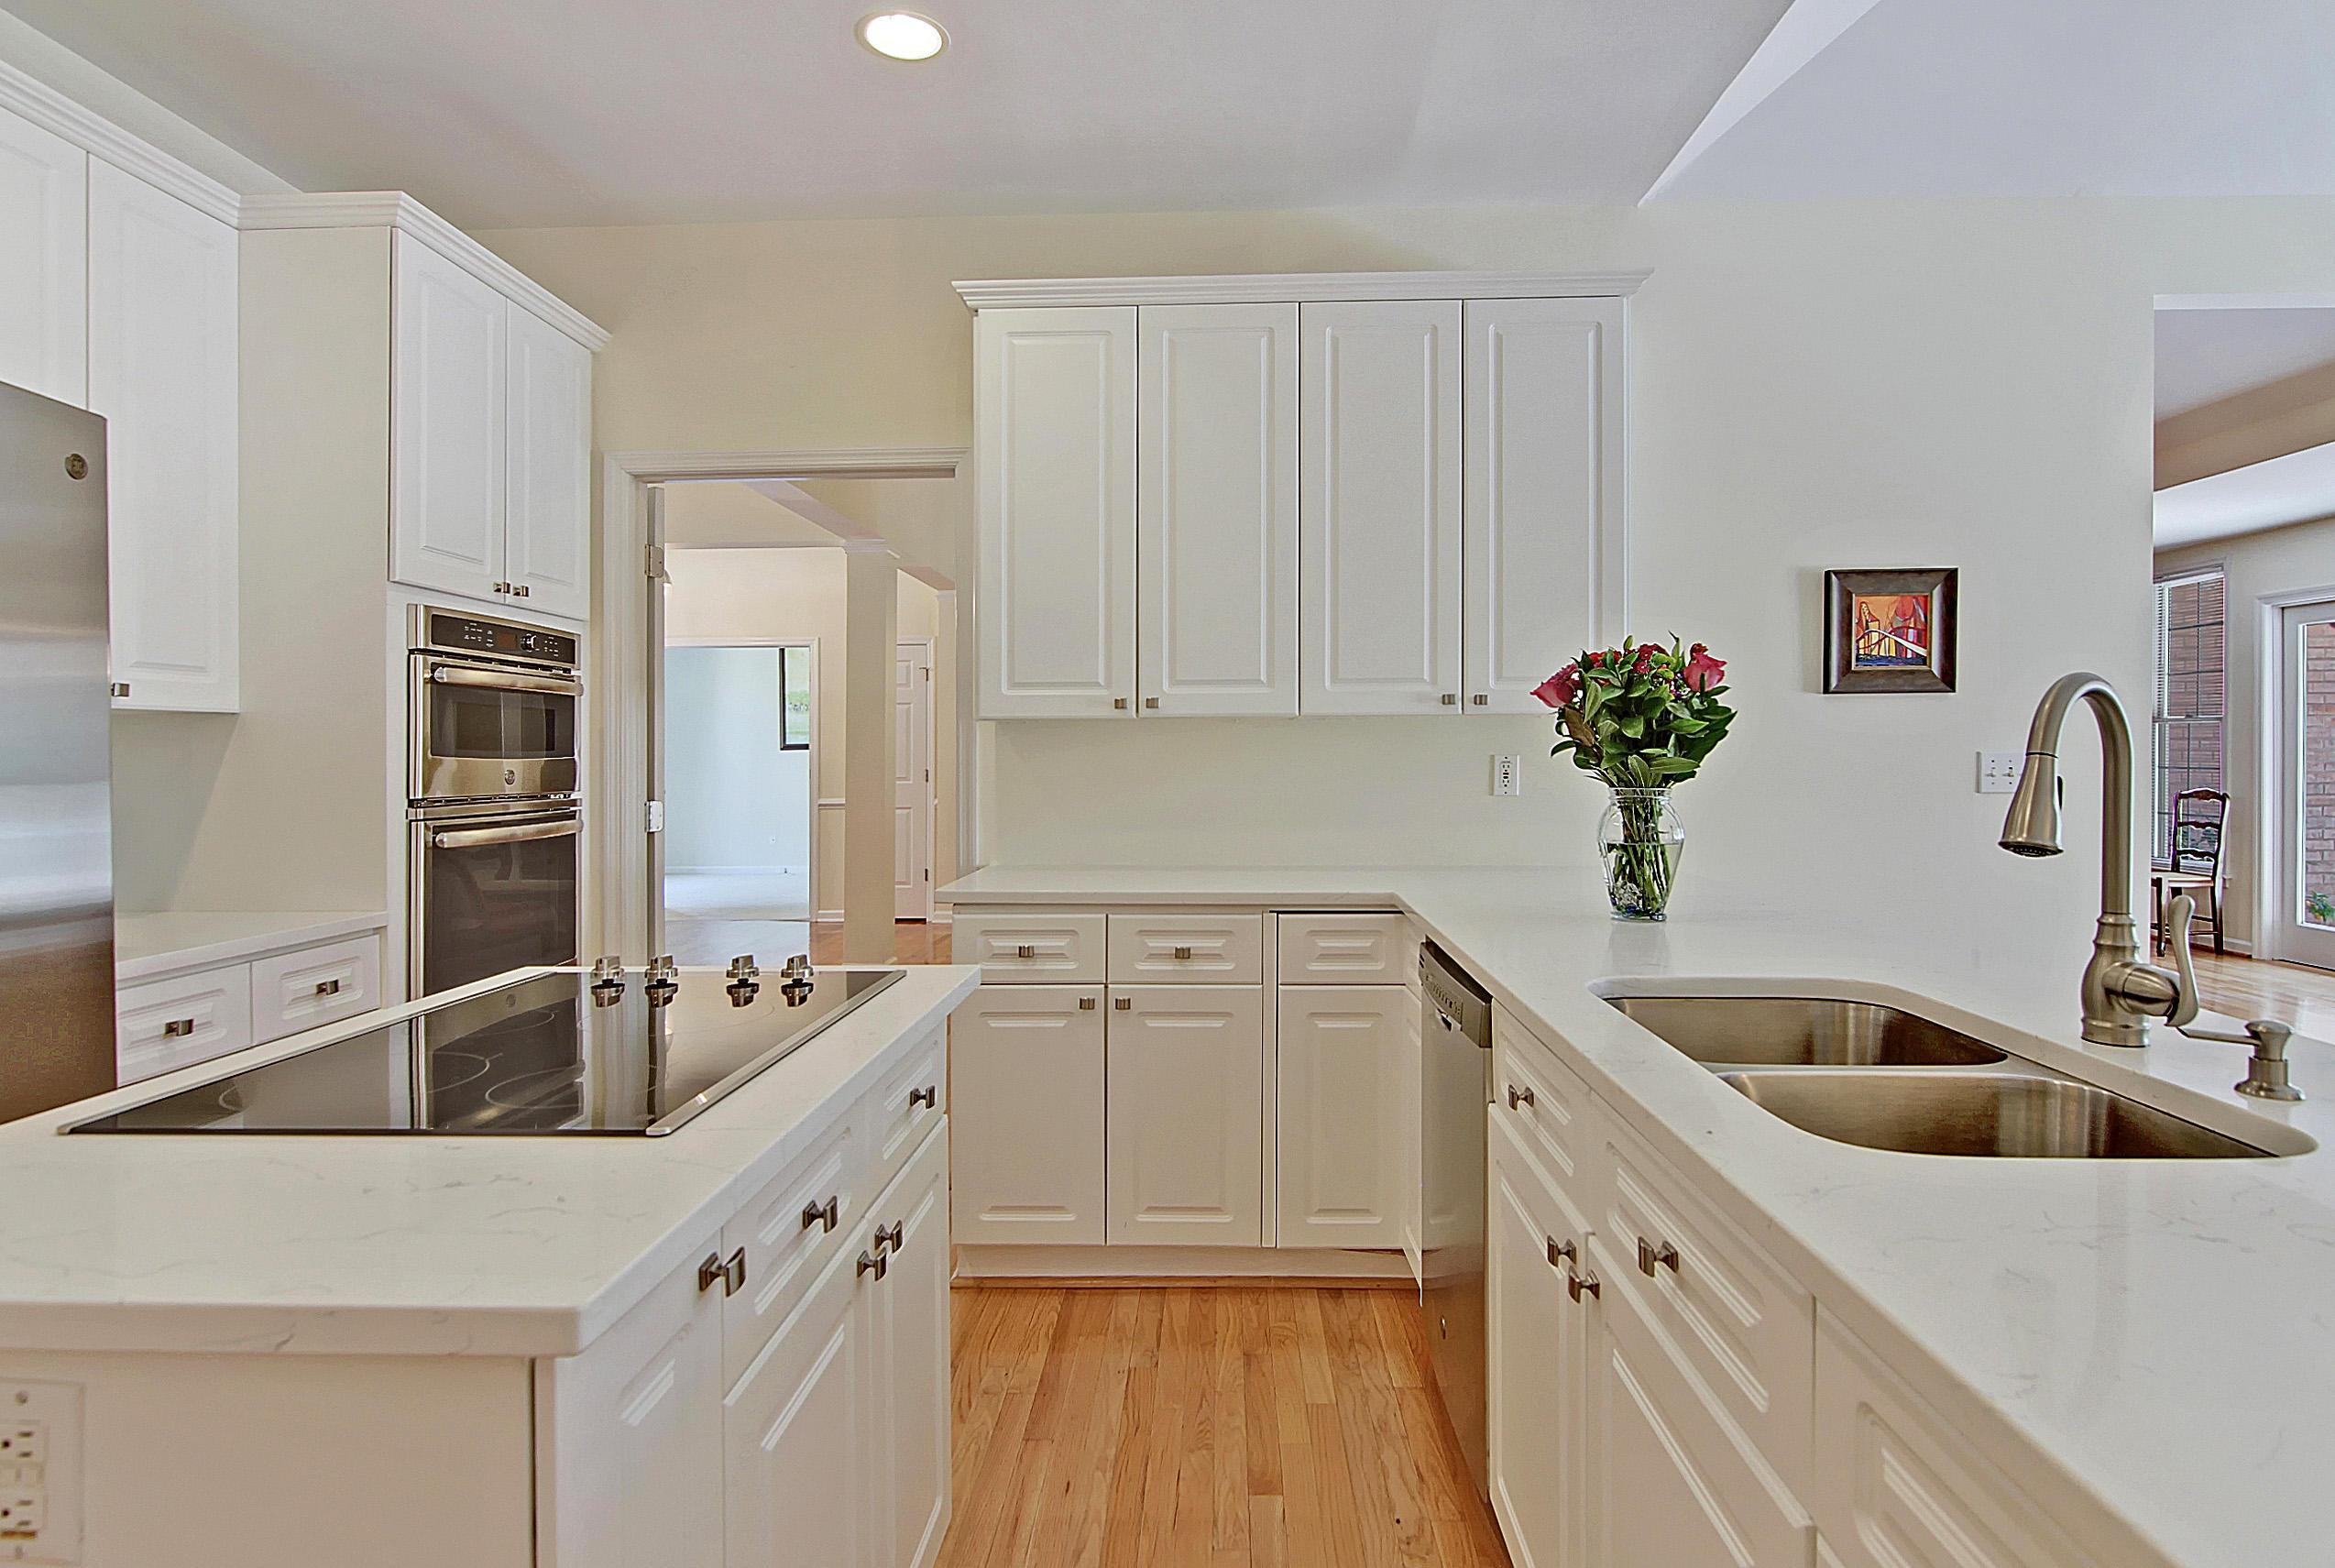 Snee Farm Homes For Sale - 1157 Shilling, Mount Pleasant, SC - 37